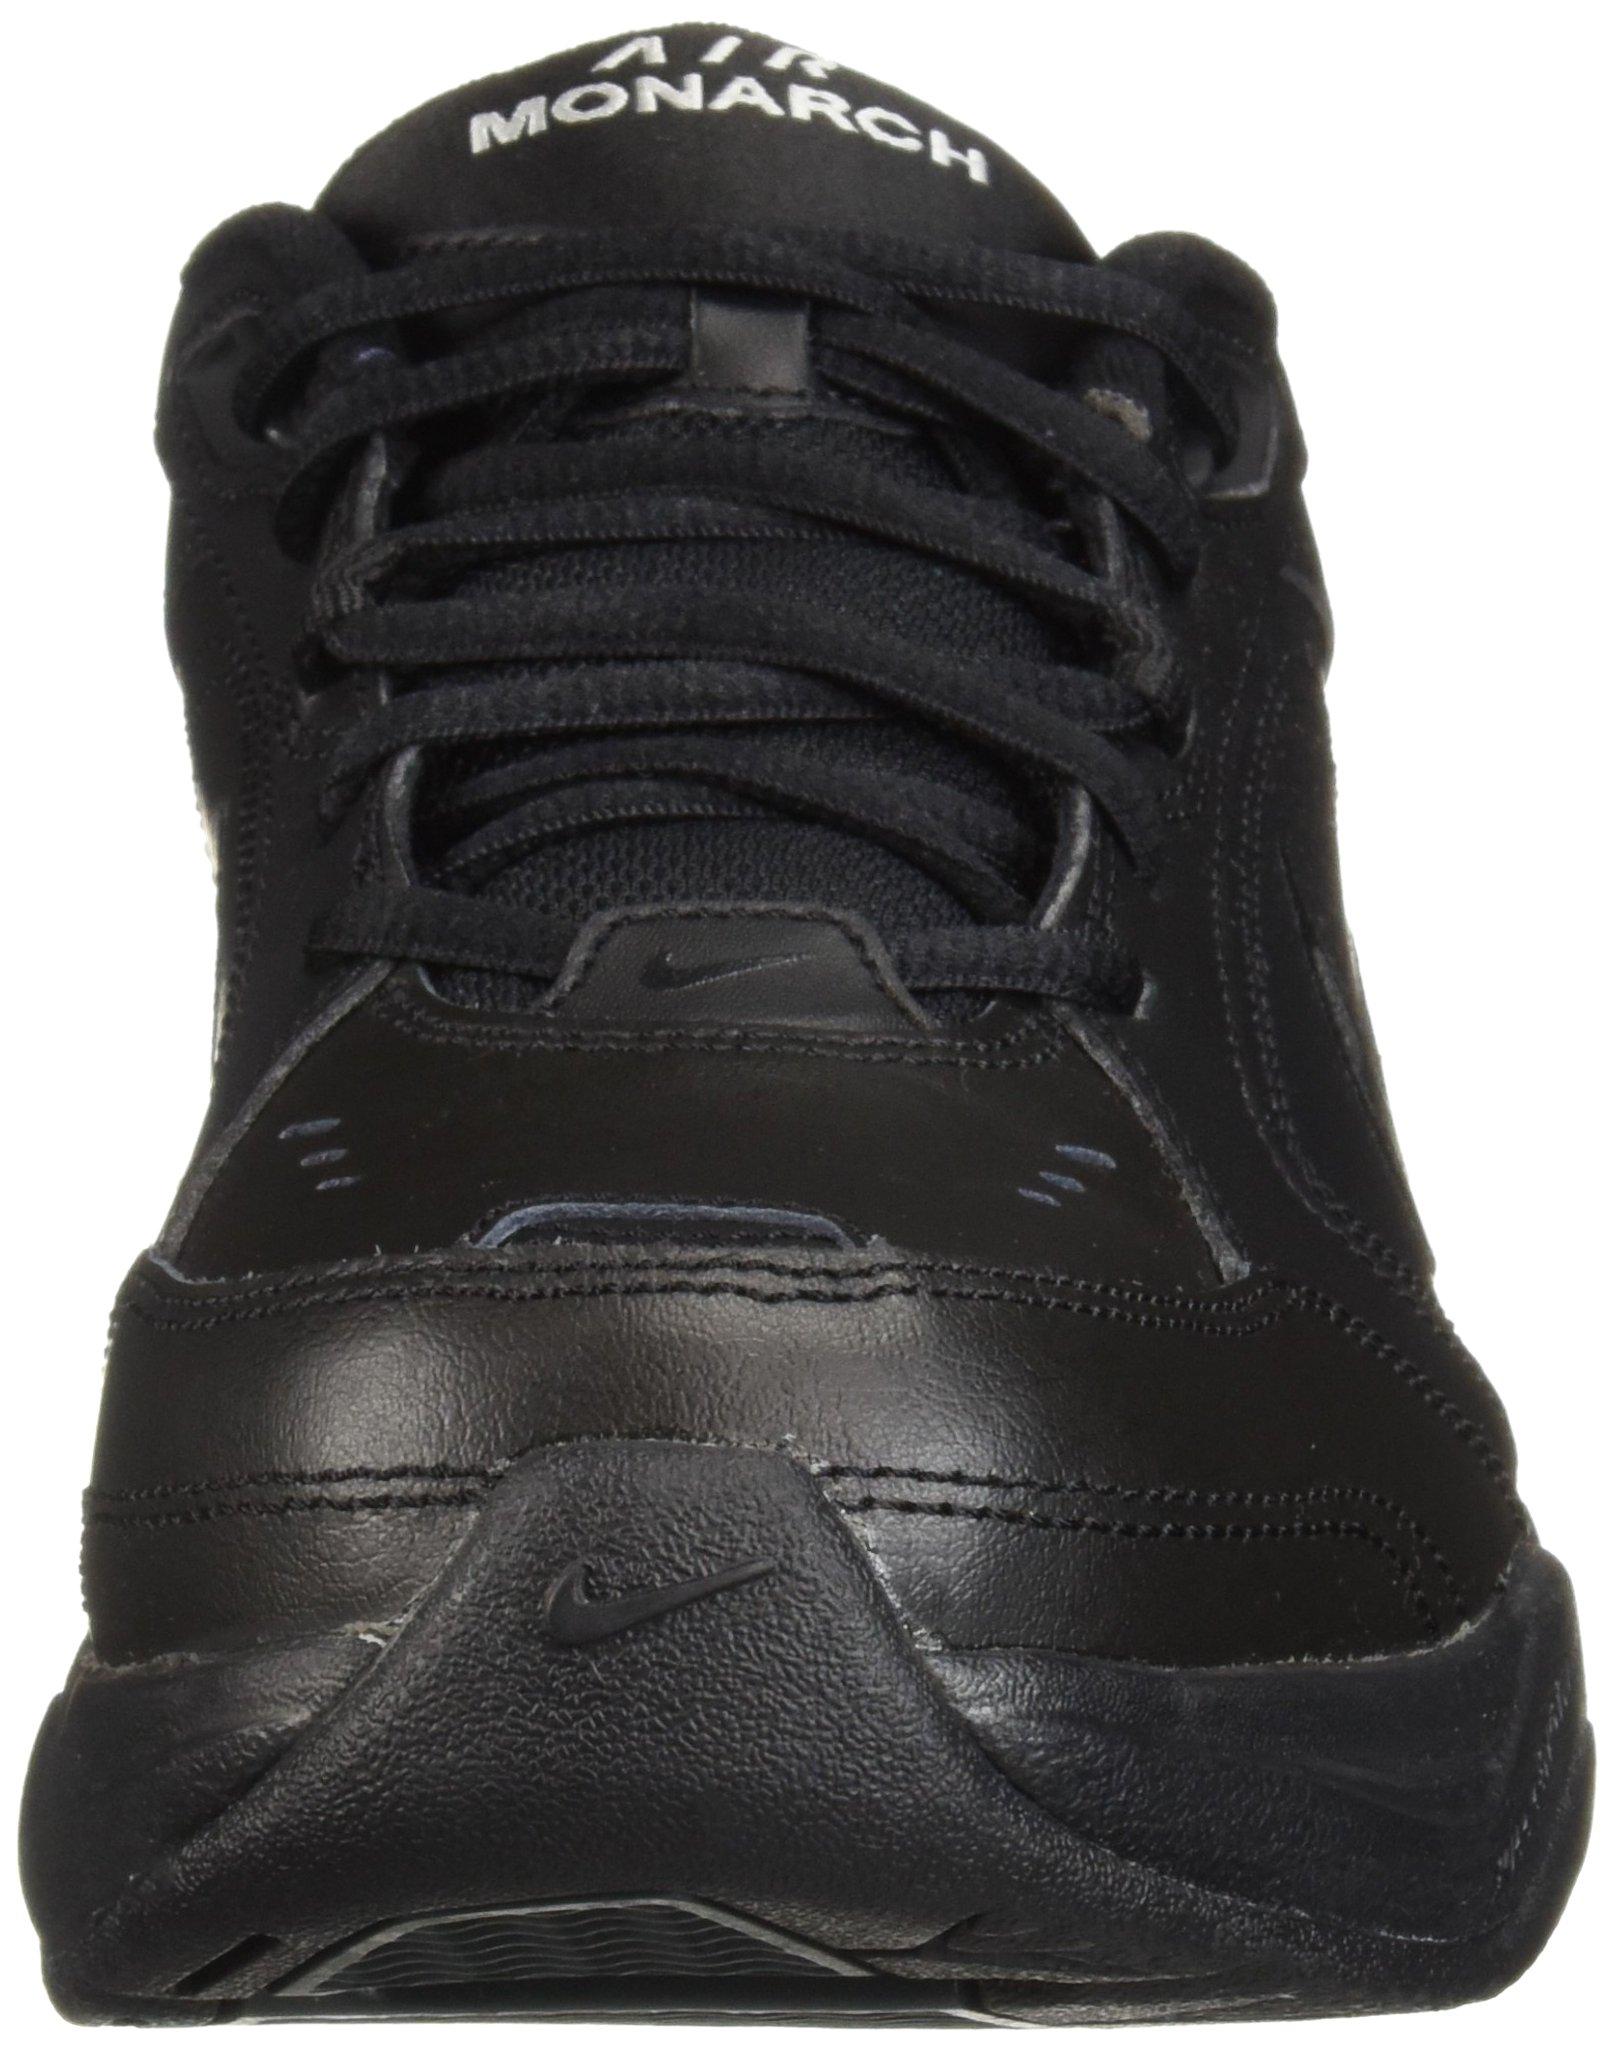 Nike-Men-039-s-Air-Monarch-IV-Cross-Trainer-Sneaker-416355 thumbnail 3